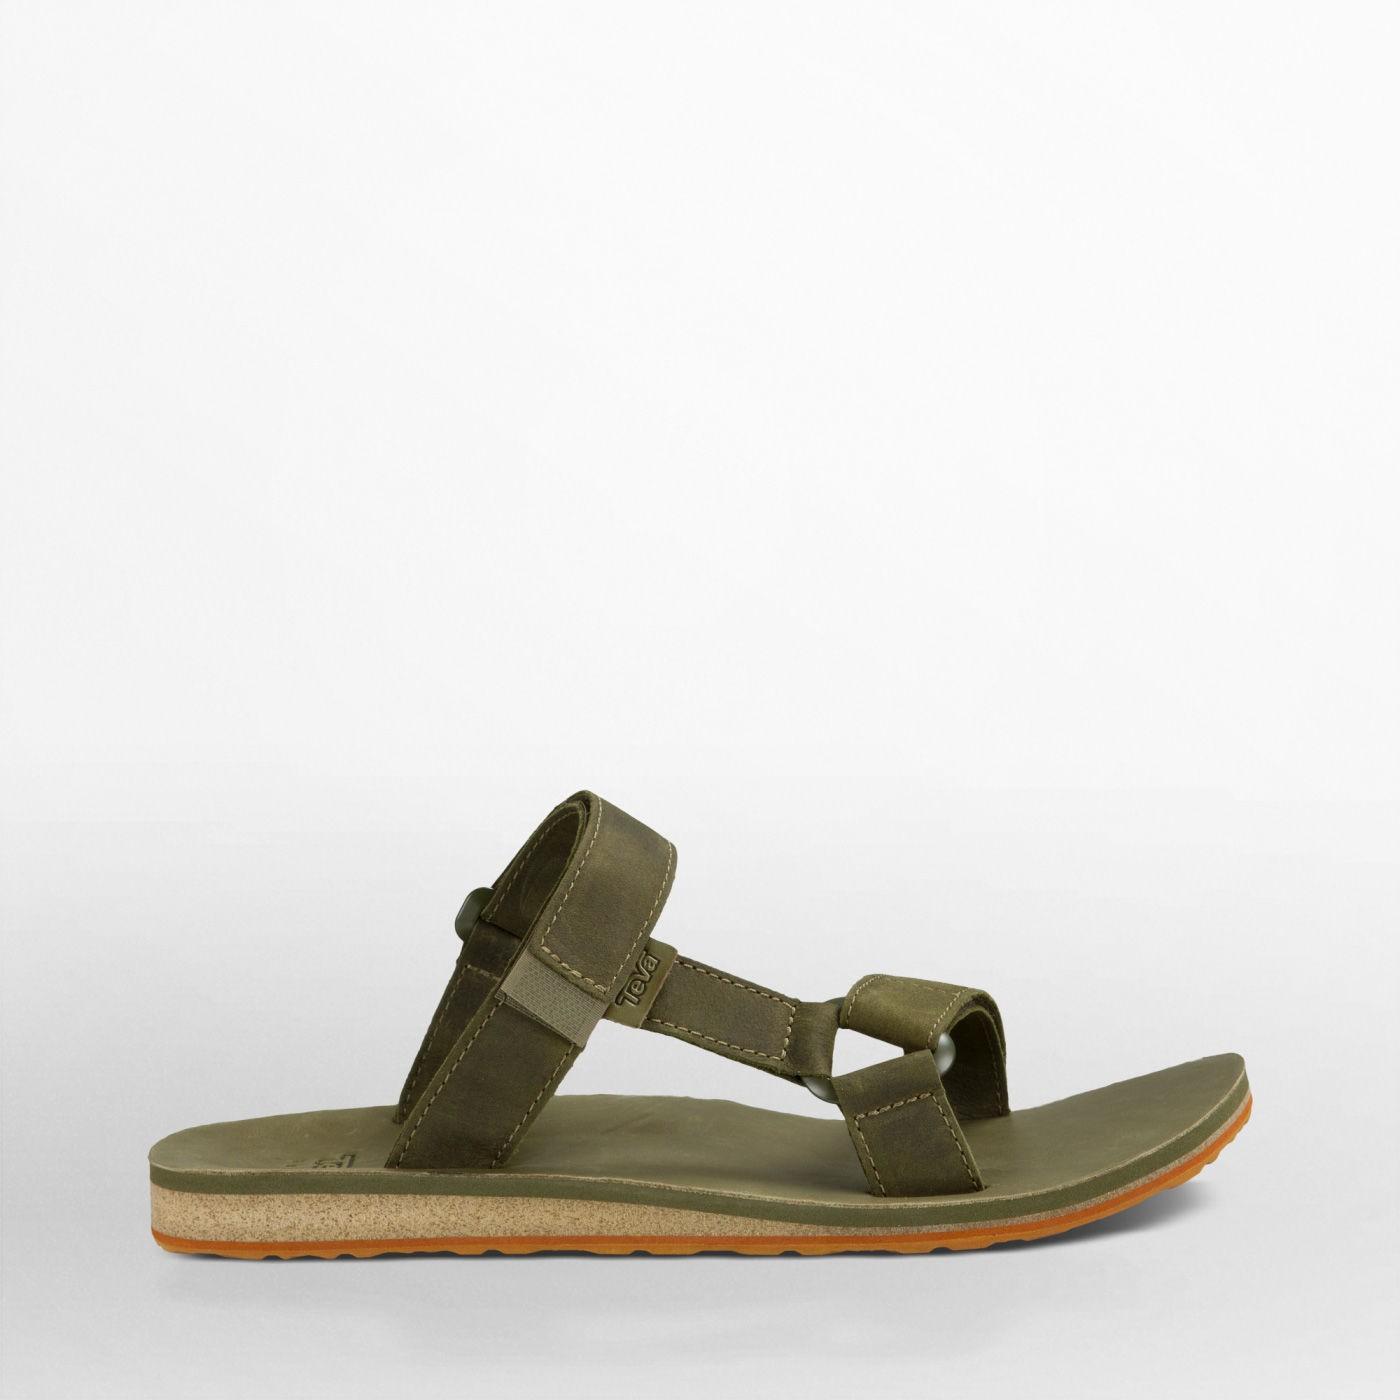 Teva Mens Universal Slide Leather : Olive